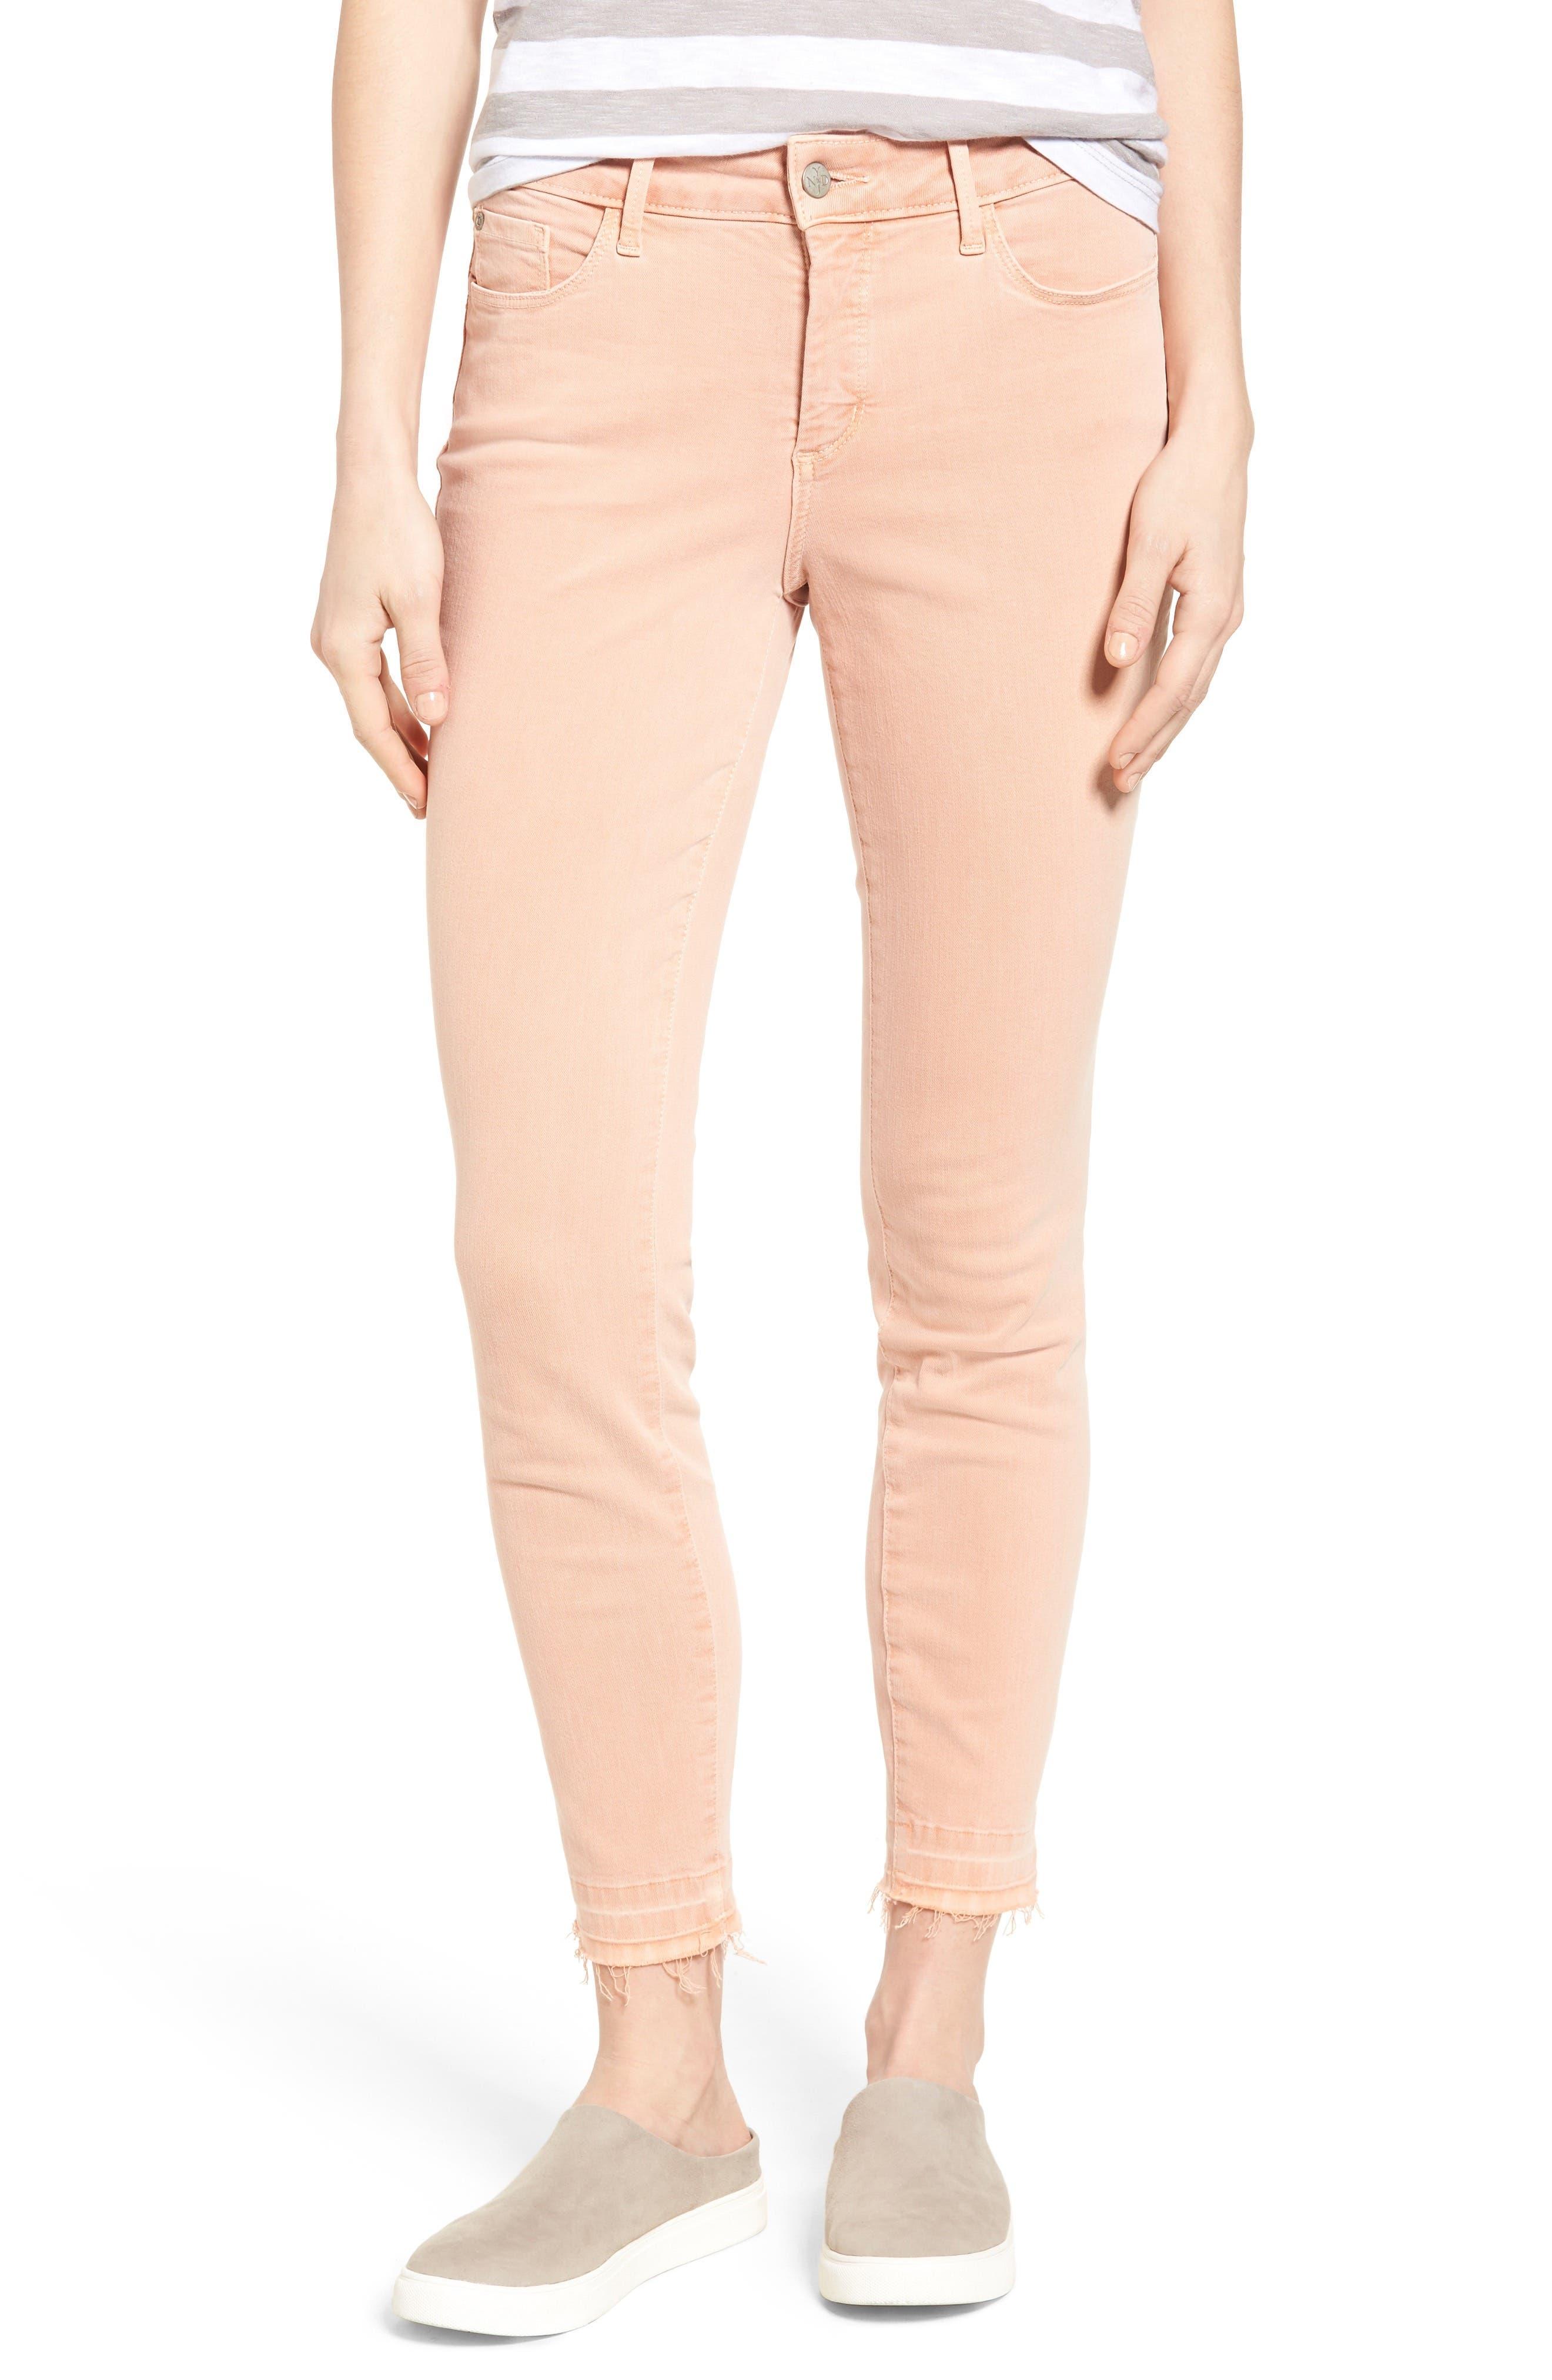 Alternate Image 1 Selected - NYDJ Ami Release Hem Stretch Skinny Jeans (Regular & Petite)